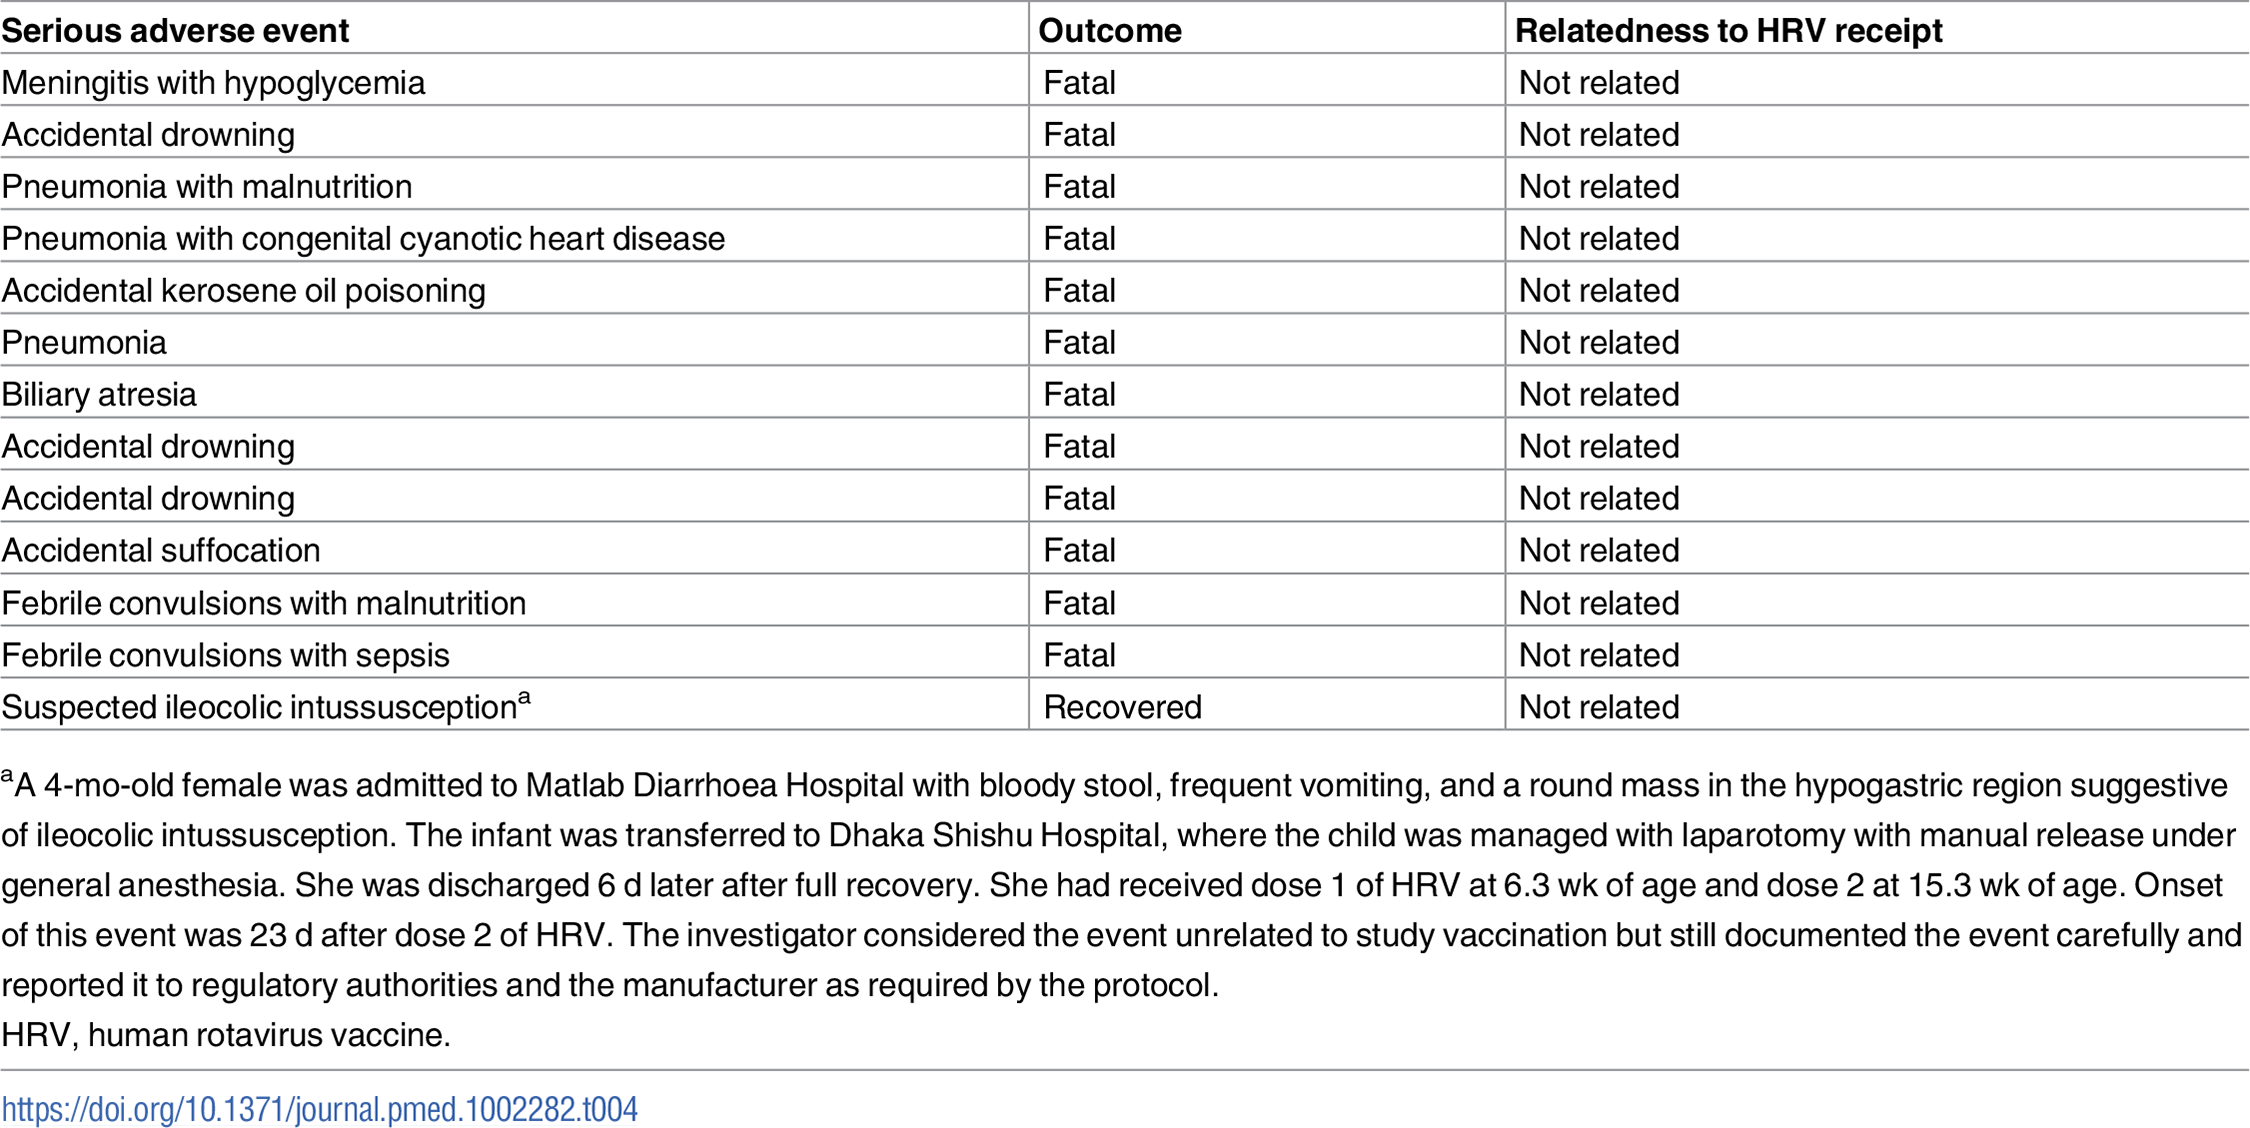 Serious adverse events identified among human rotavirus vaccine recipients.